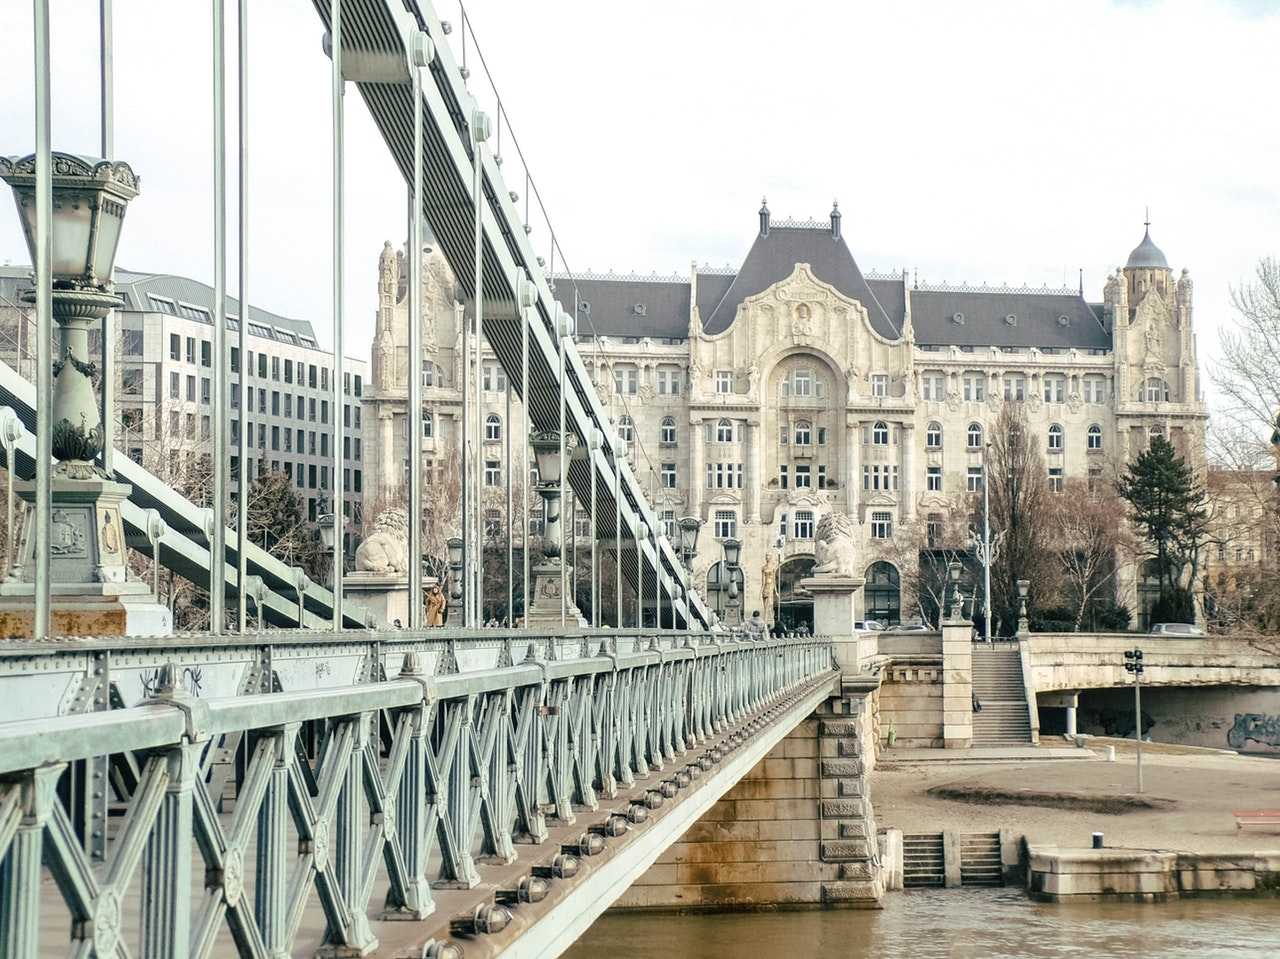 budapest_9_lanchid_foto_pexels_com_nagy_niki.jpg